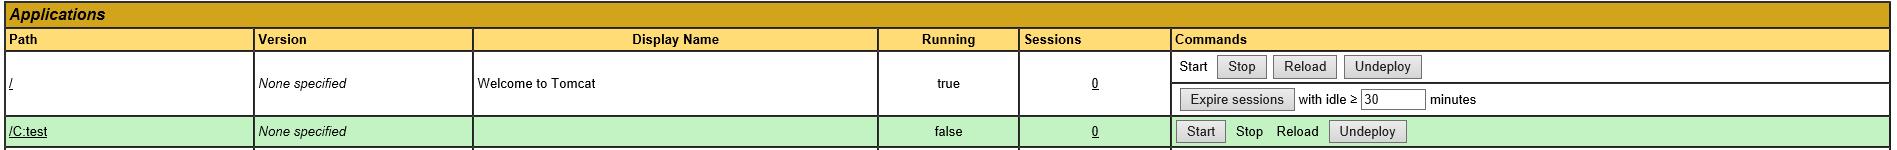 tomcat 8.5 13 documentation